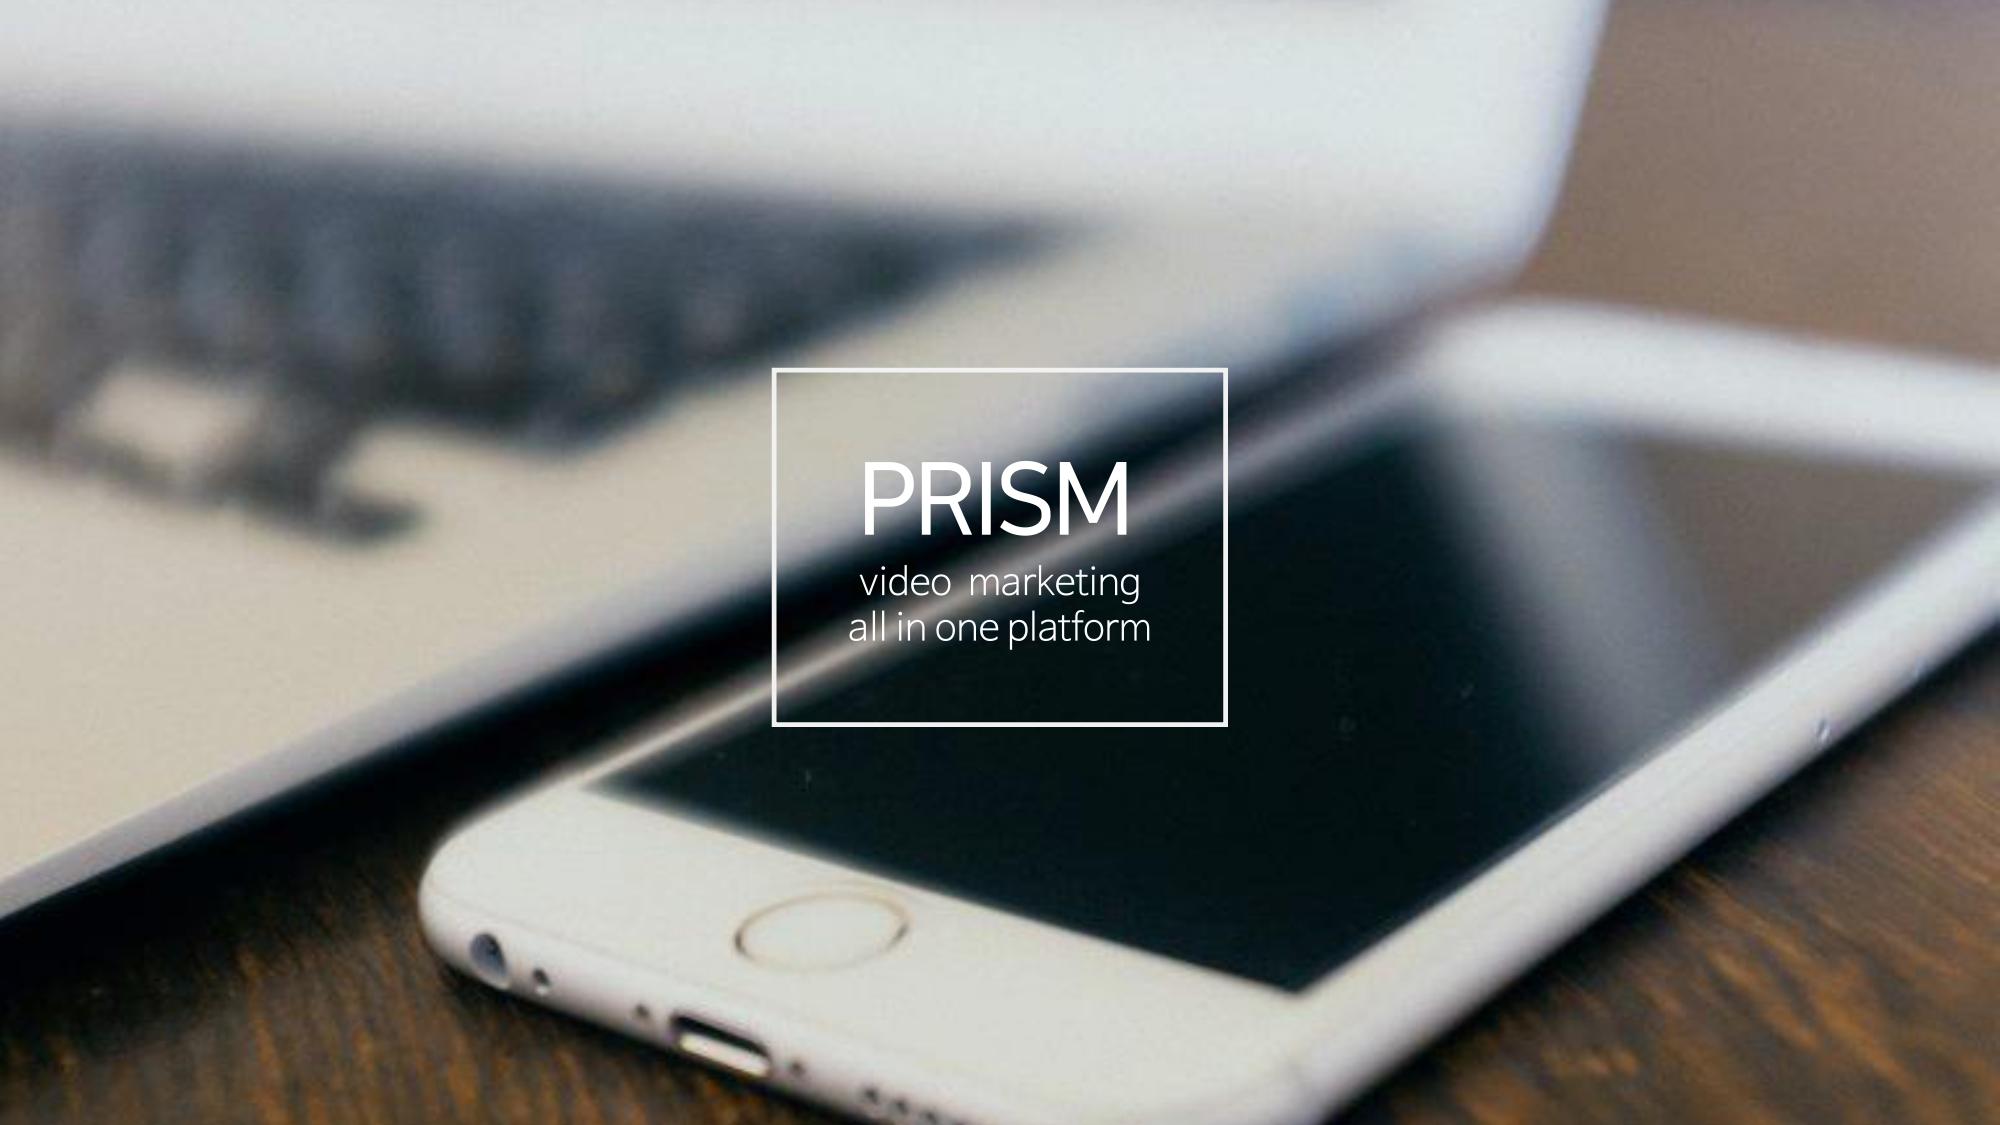 2019_Prism_통합제안서_pages-to-jpg-0001.jpg